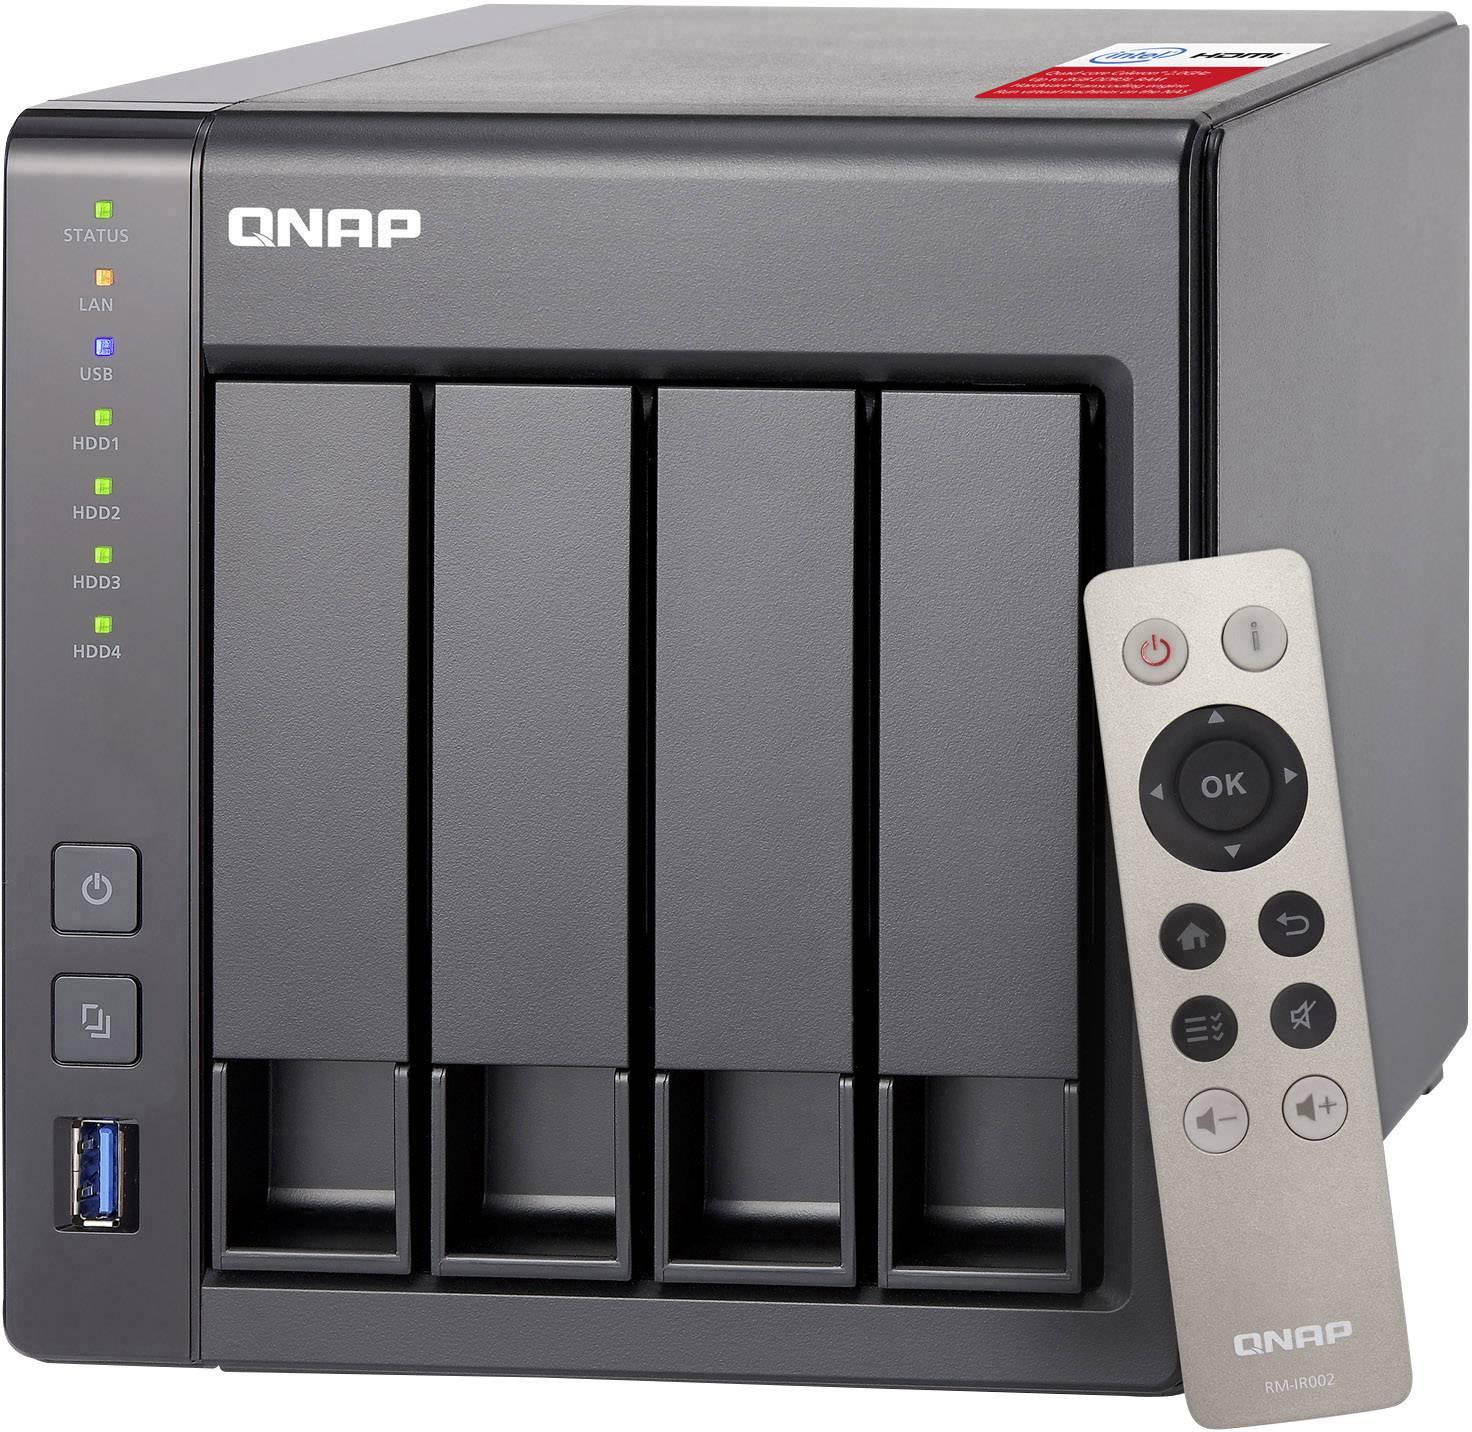 QNAP TS-451+-2G TS-451+-2G